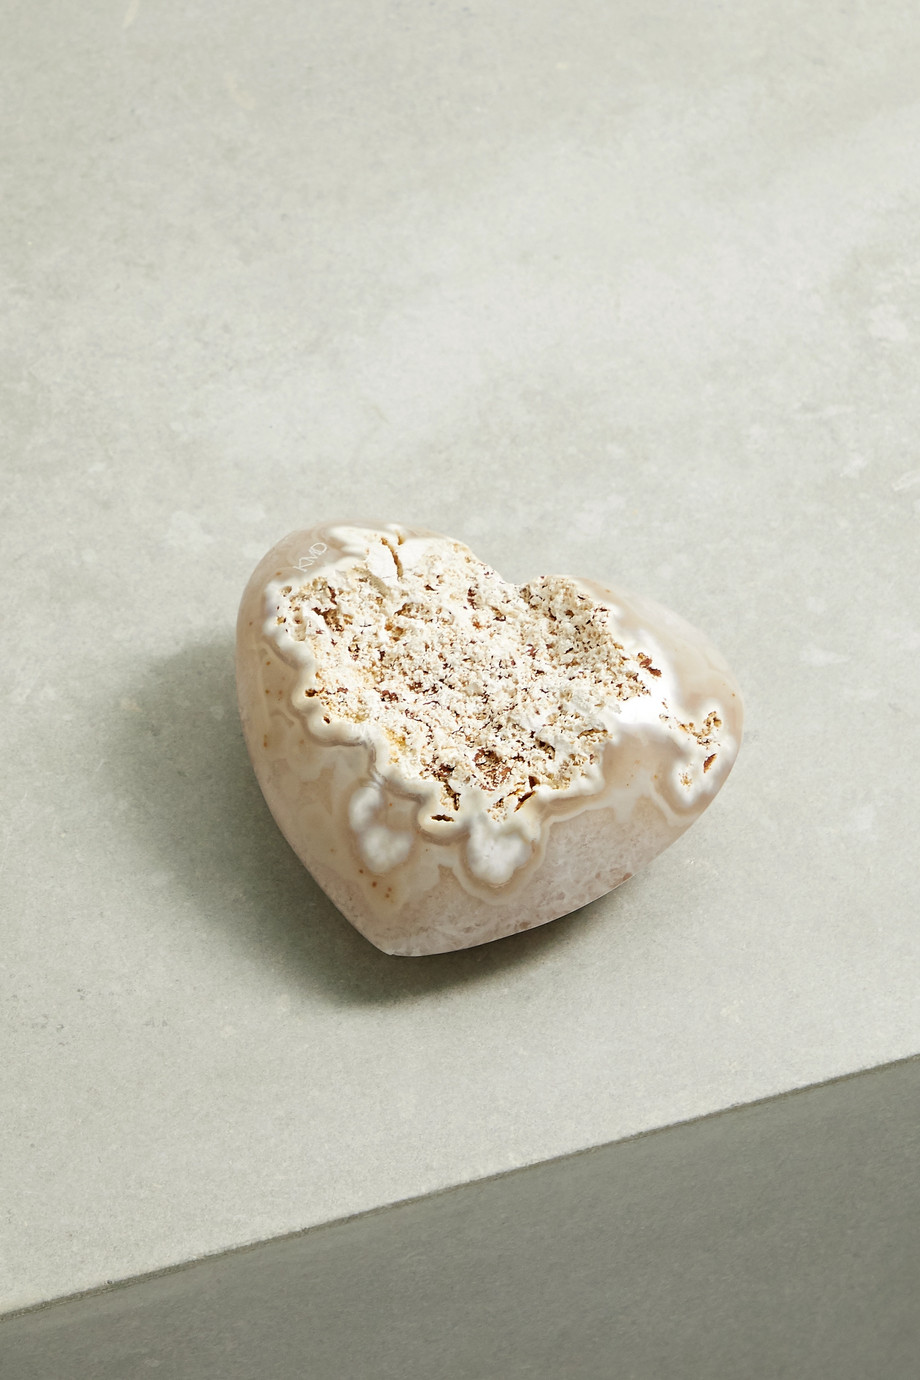 Kimberly McDonald Heart mineral geode